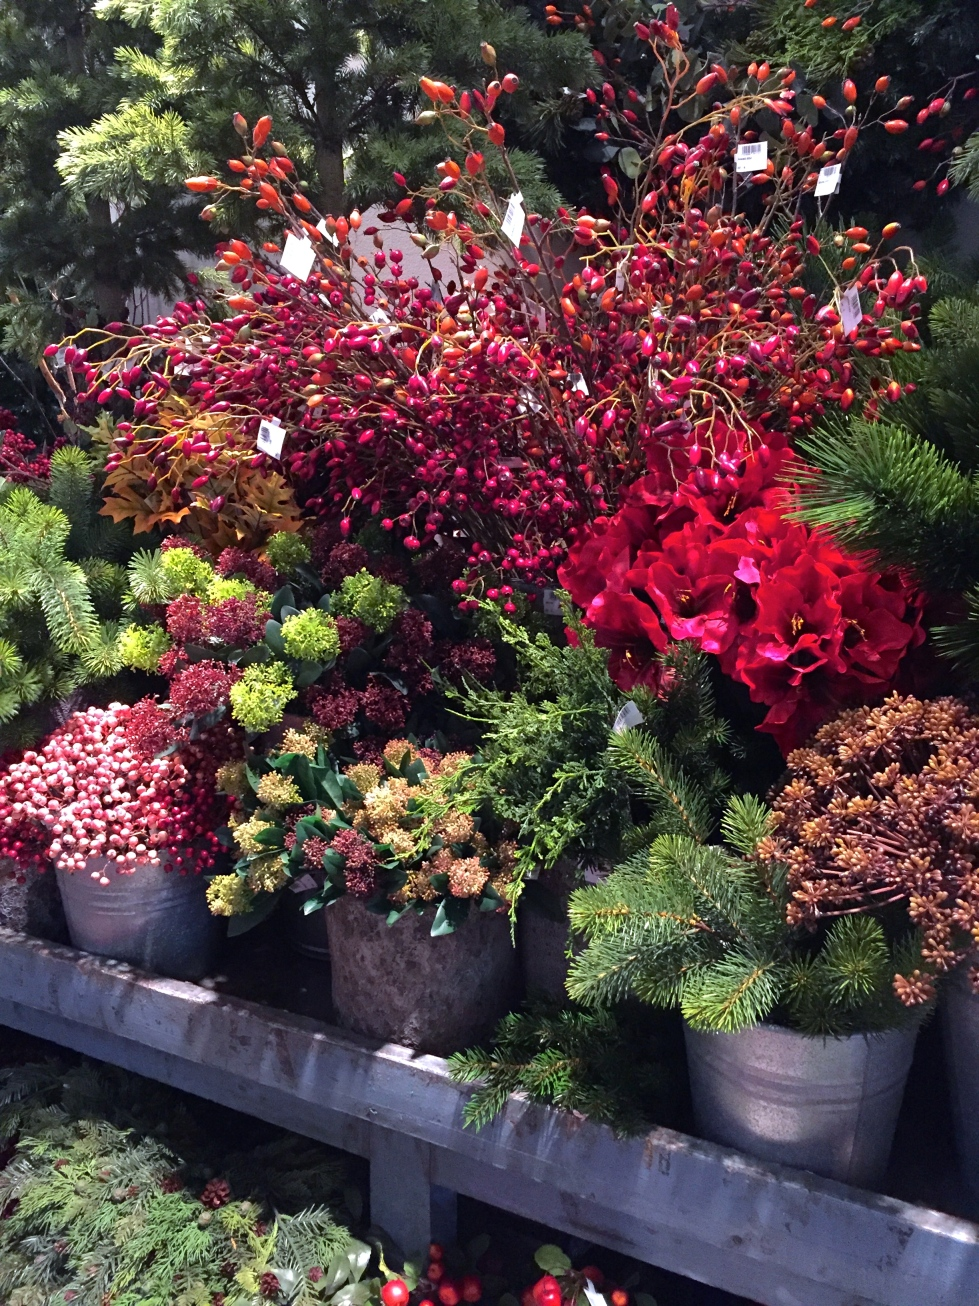 Artificial Christmas flowers and foliage, Christmas World, February 2017